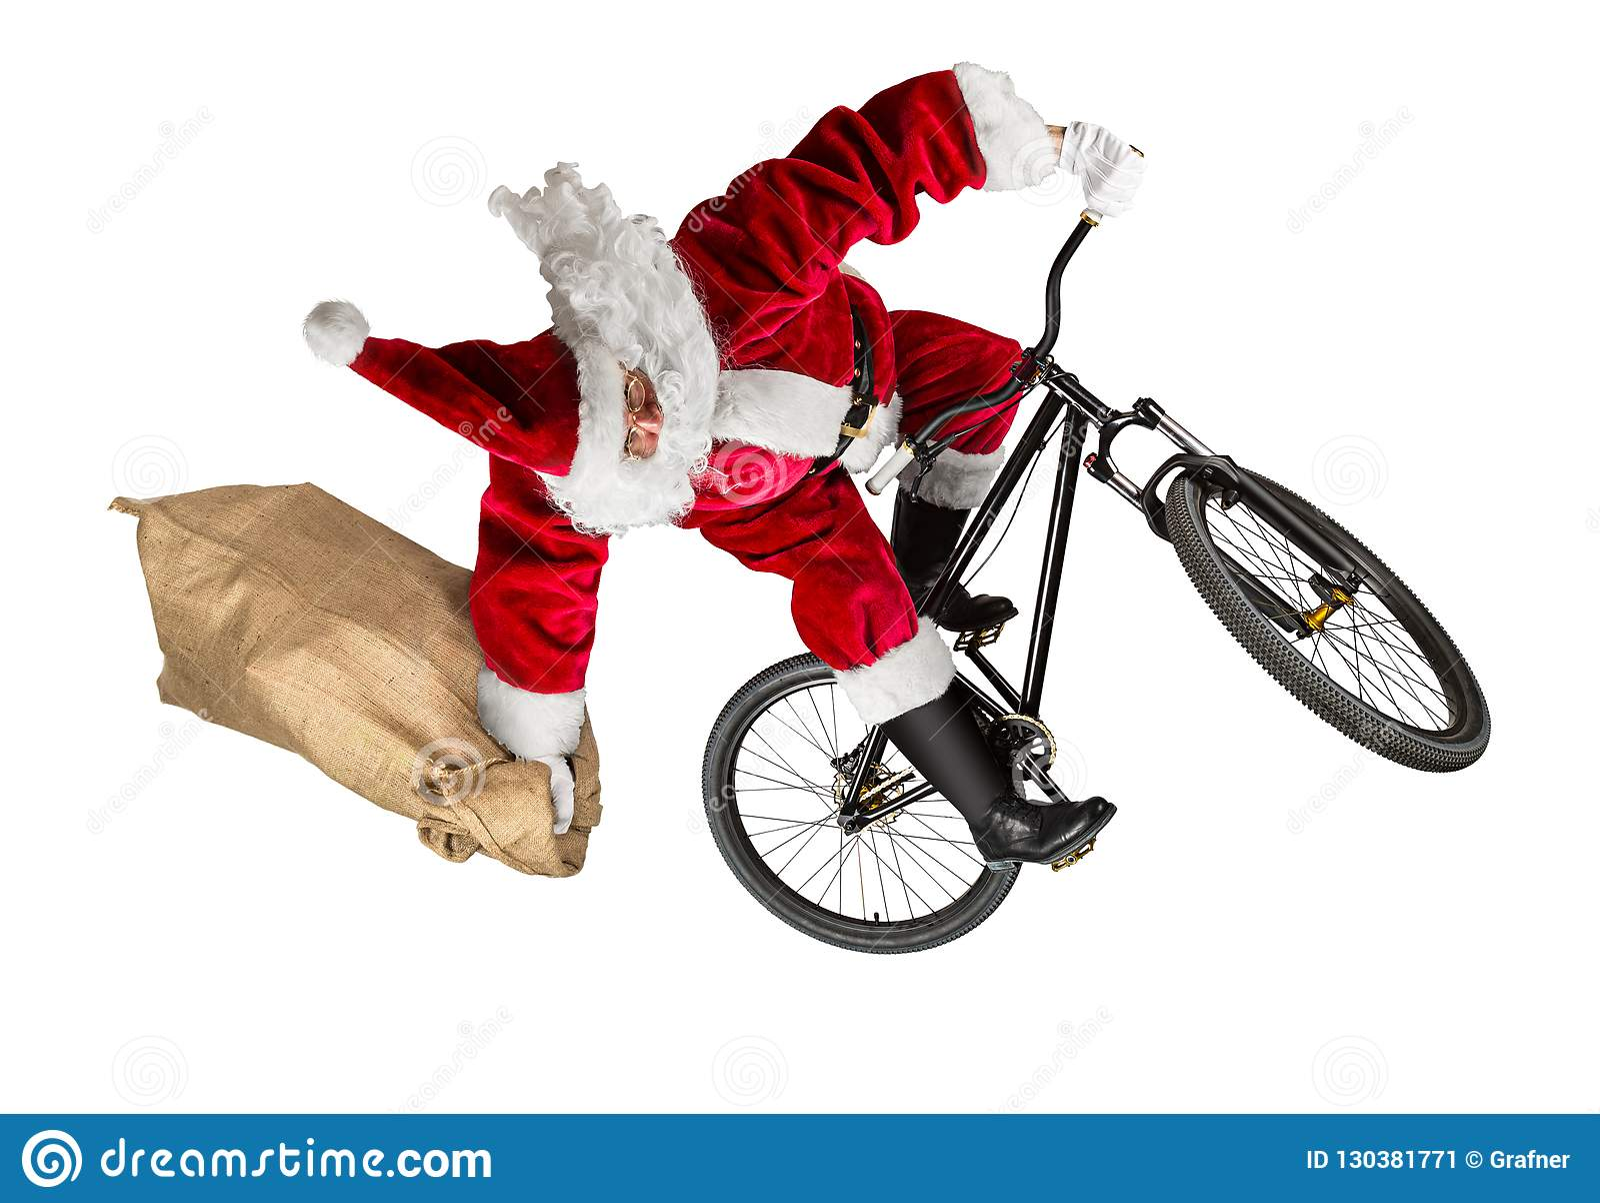 Сумасшедший Санта Клаус скачет на горный велосипед грязи с ба мешковины джута